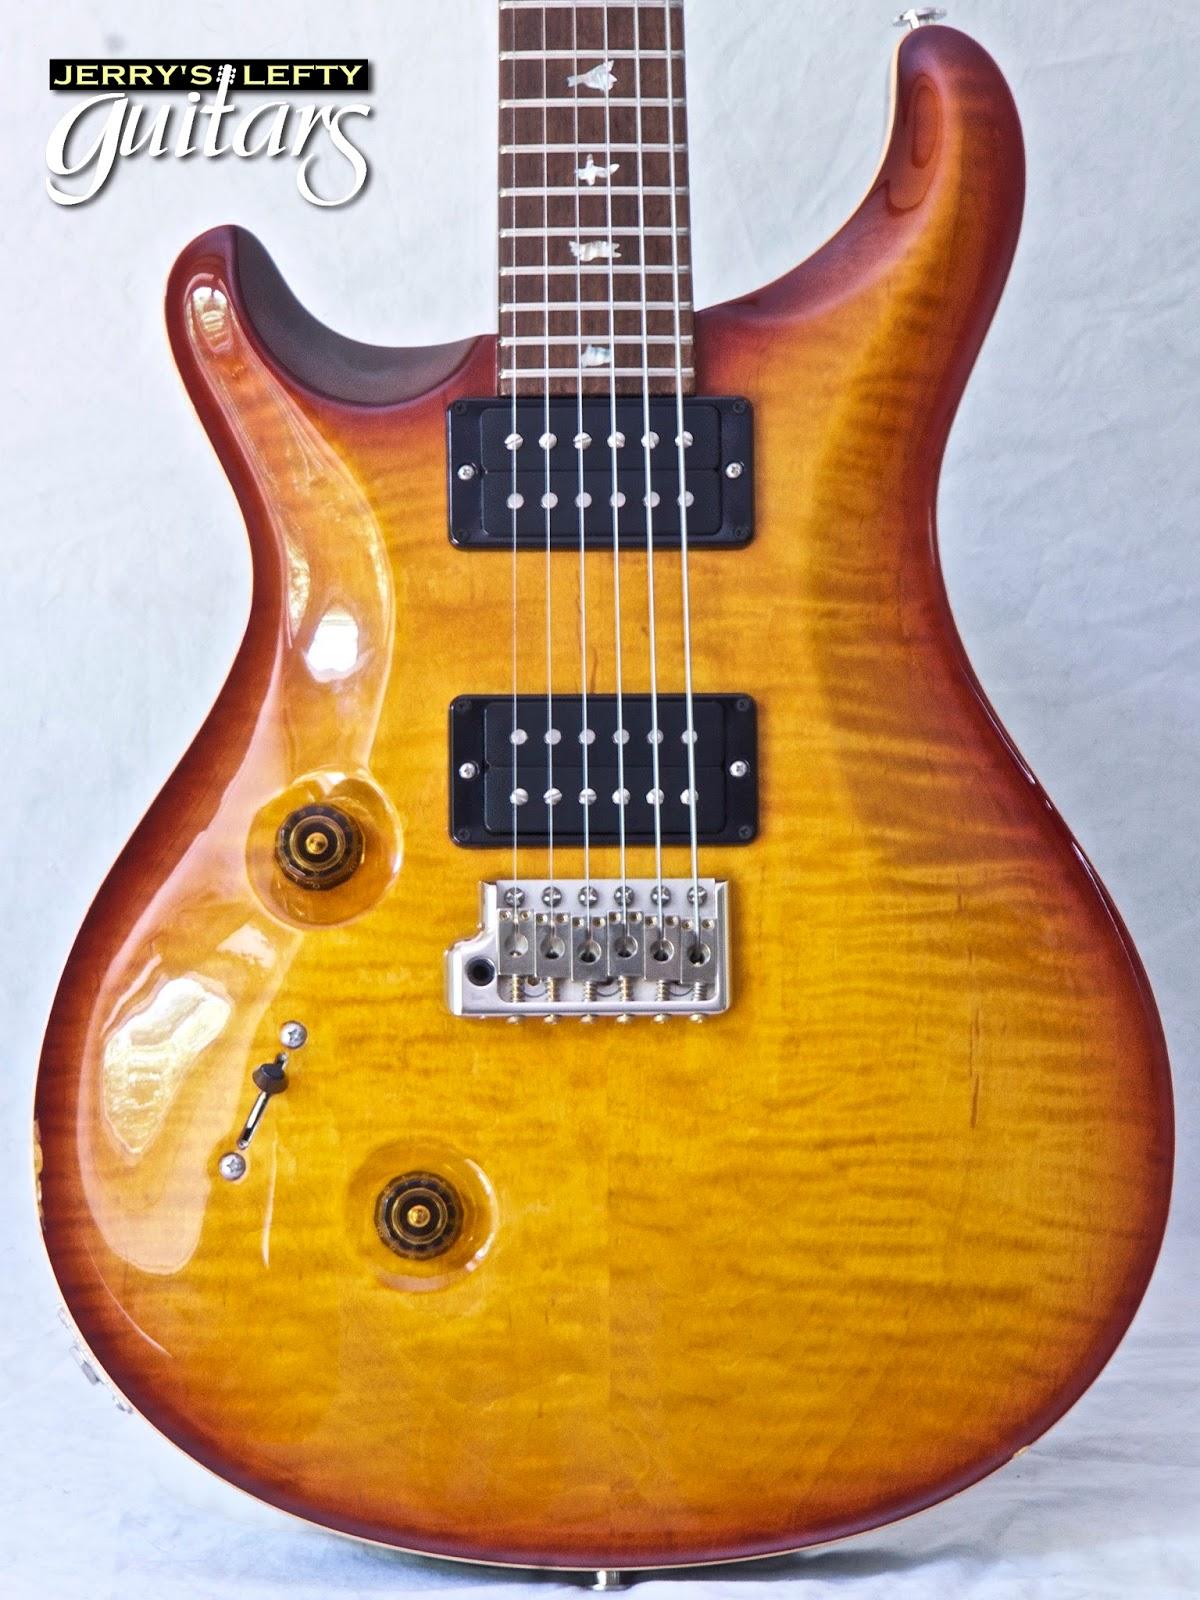 jerry 39 s lefty guitars newest guitar arrivals updated weekly 2012 prs custom 24 amber burst. Black Bedroom Furniture Sets. Home Design Ideas